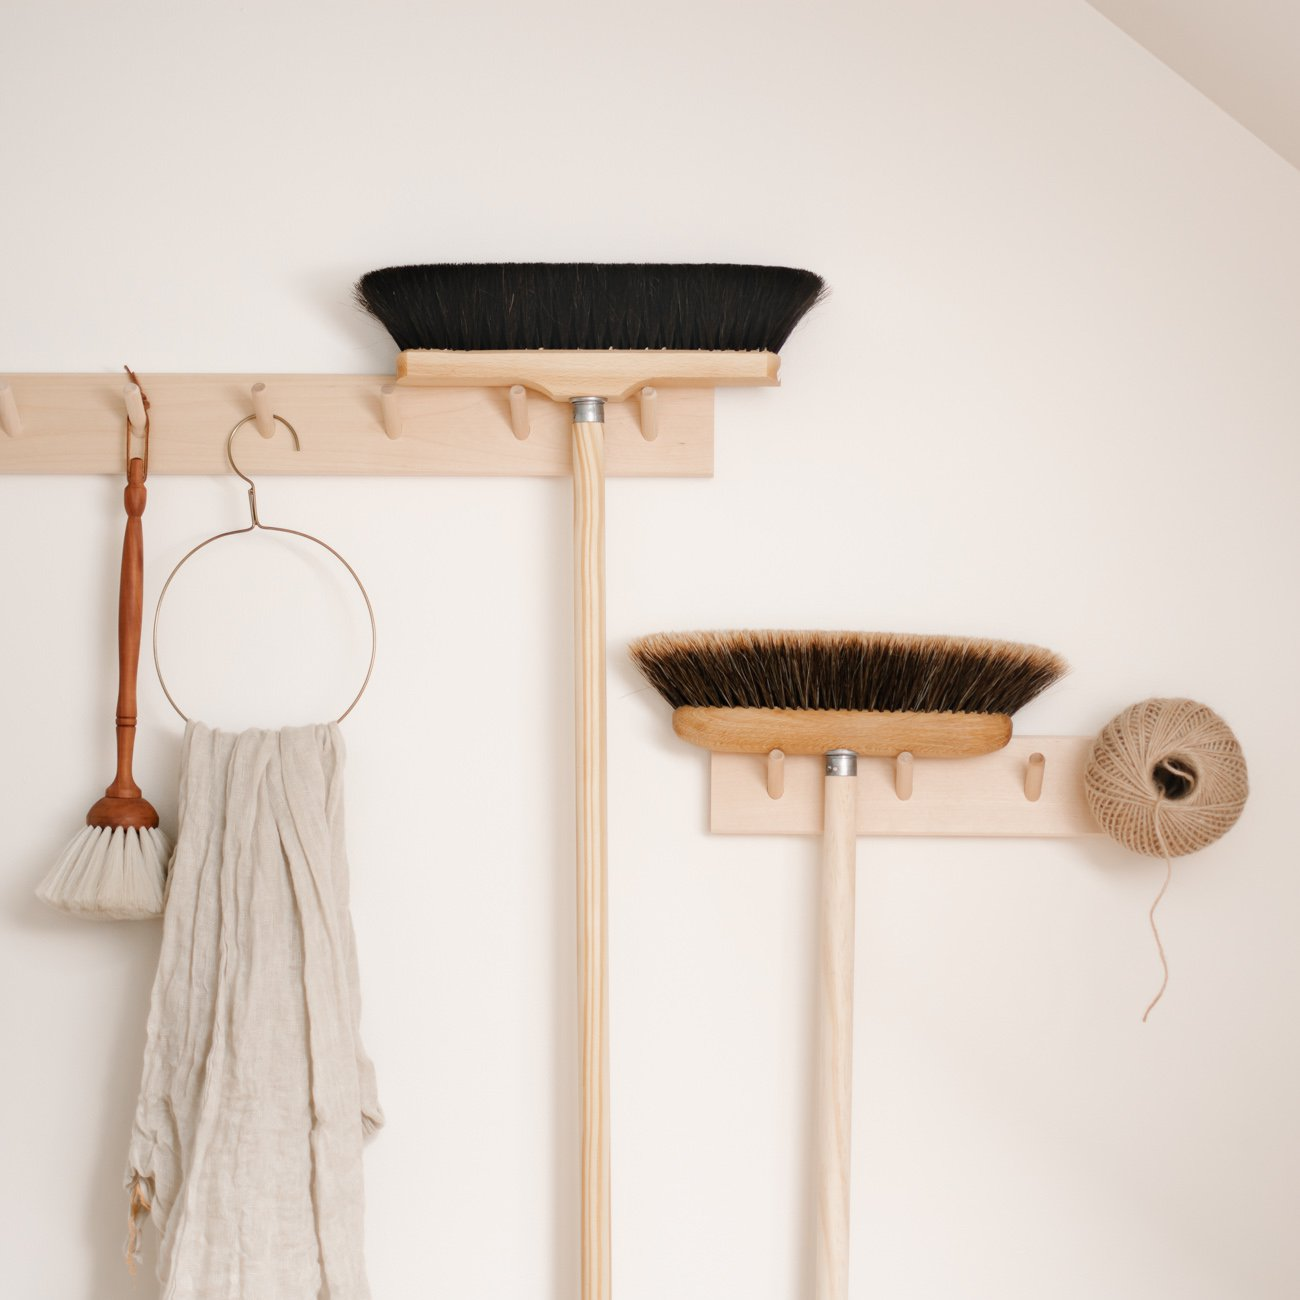 Redecker Broom | Helen Milan